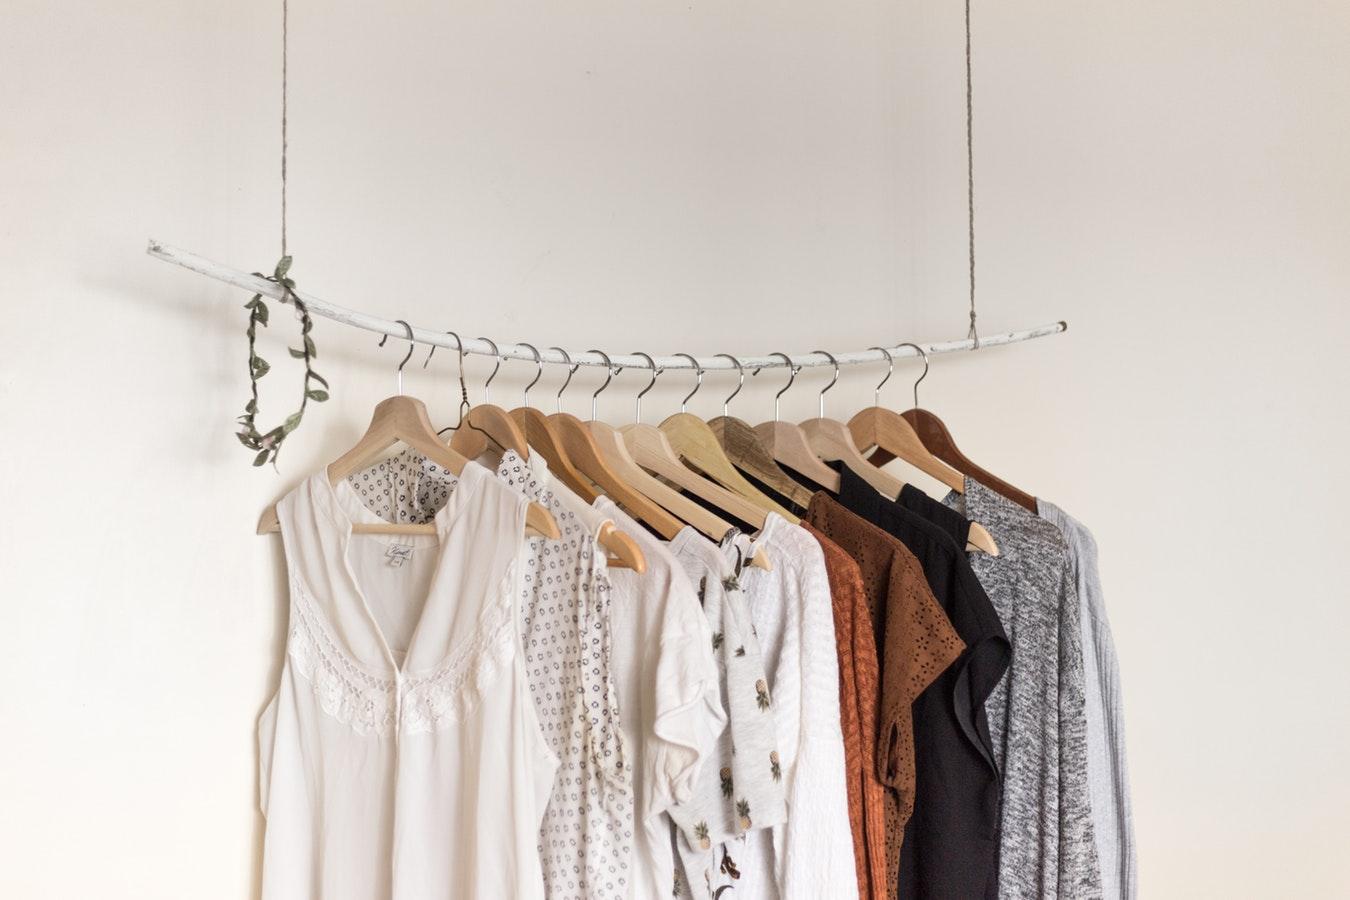 retail-fashion-business-320k-p-a-profits-2